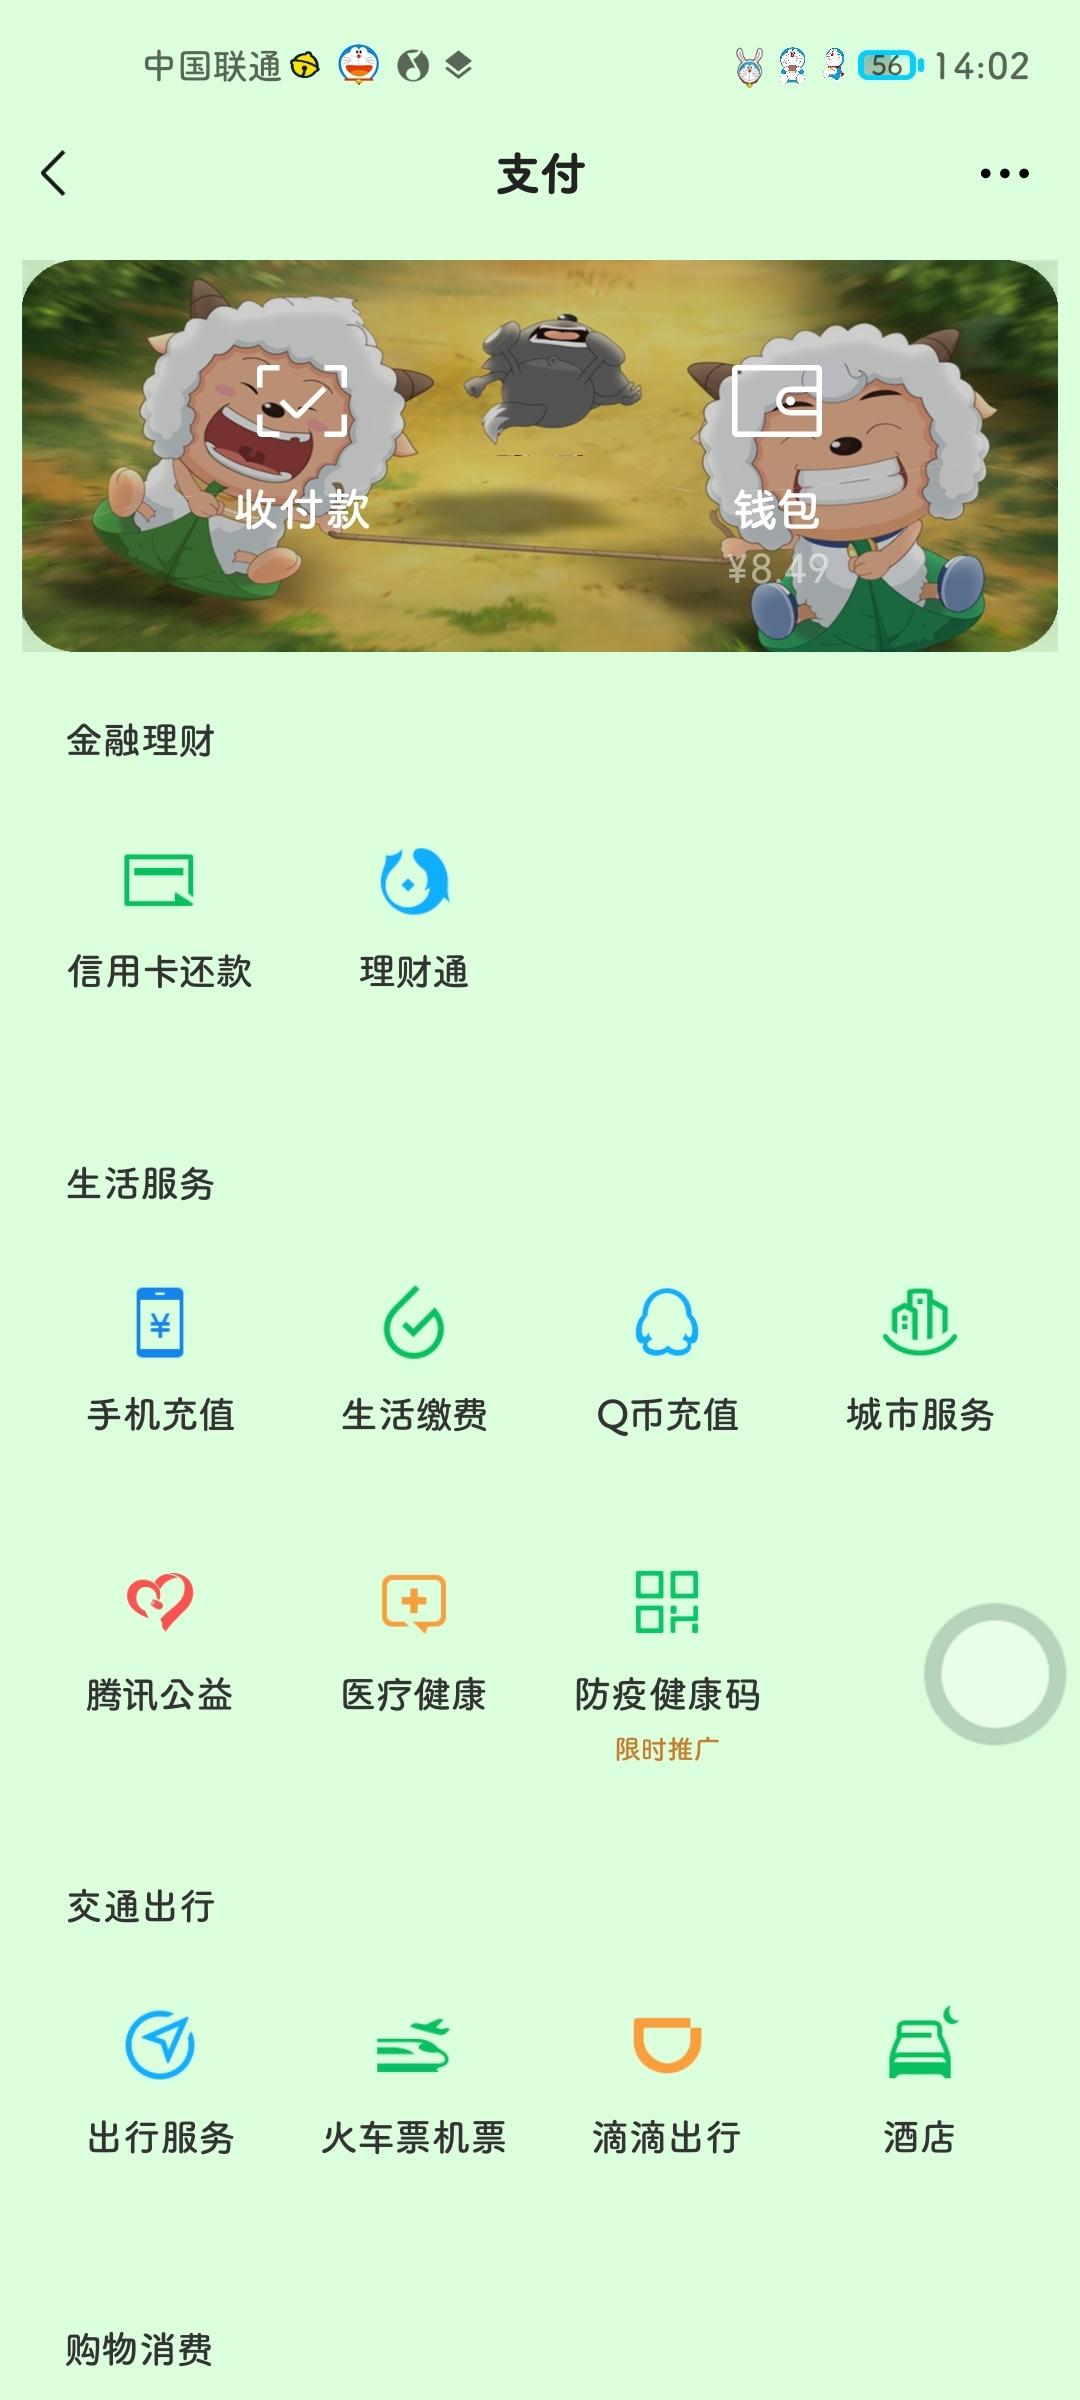 Screenshot_20210501_140254_com.tencent.mm.jpg